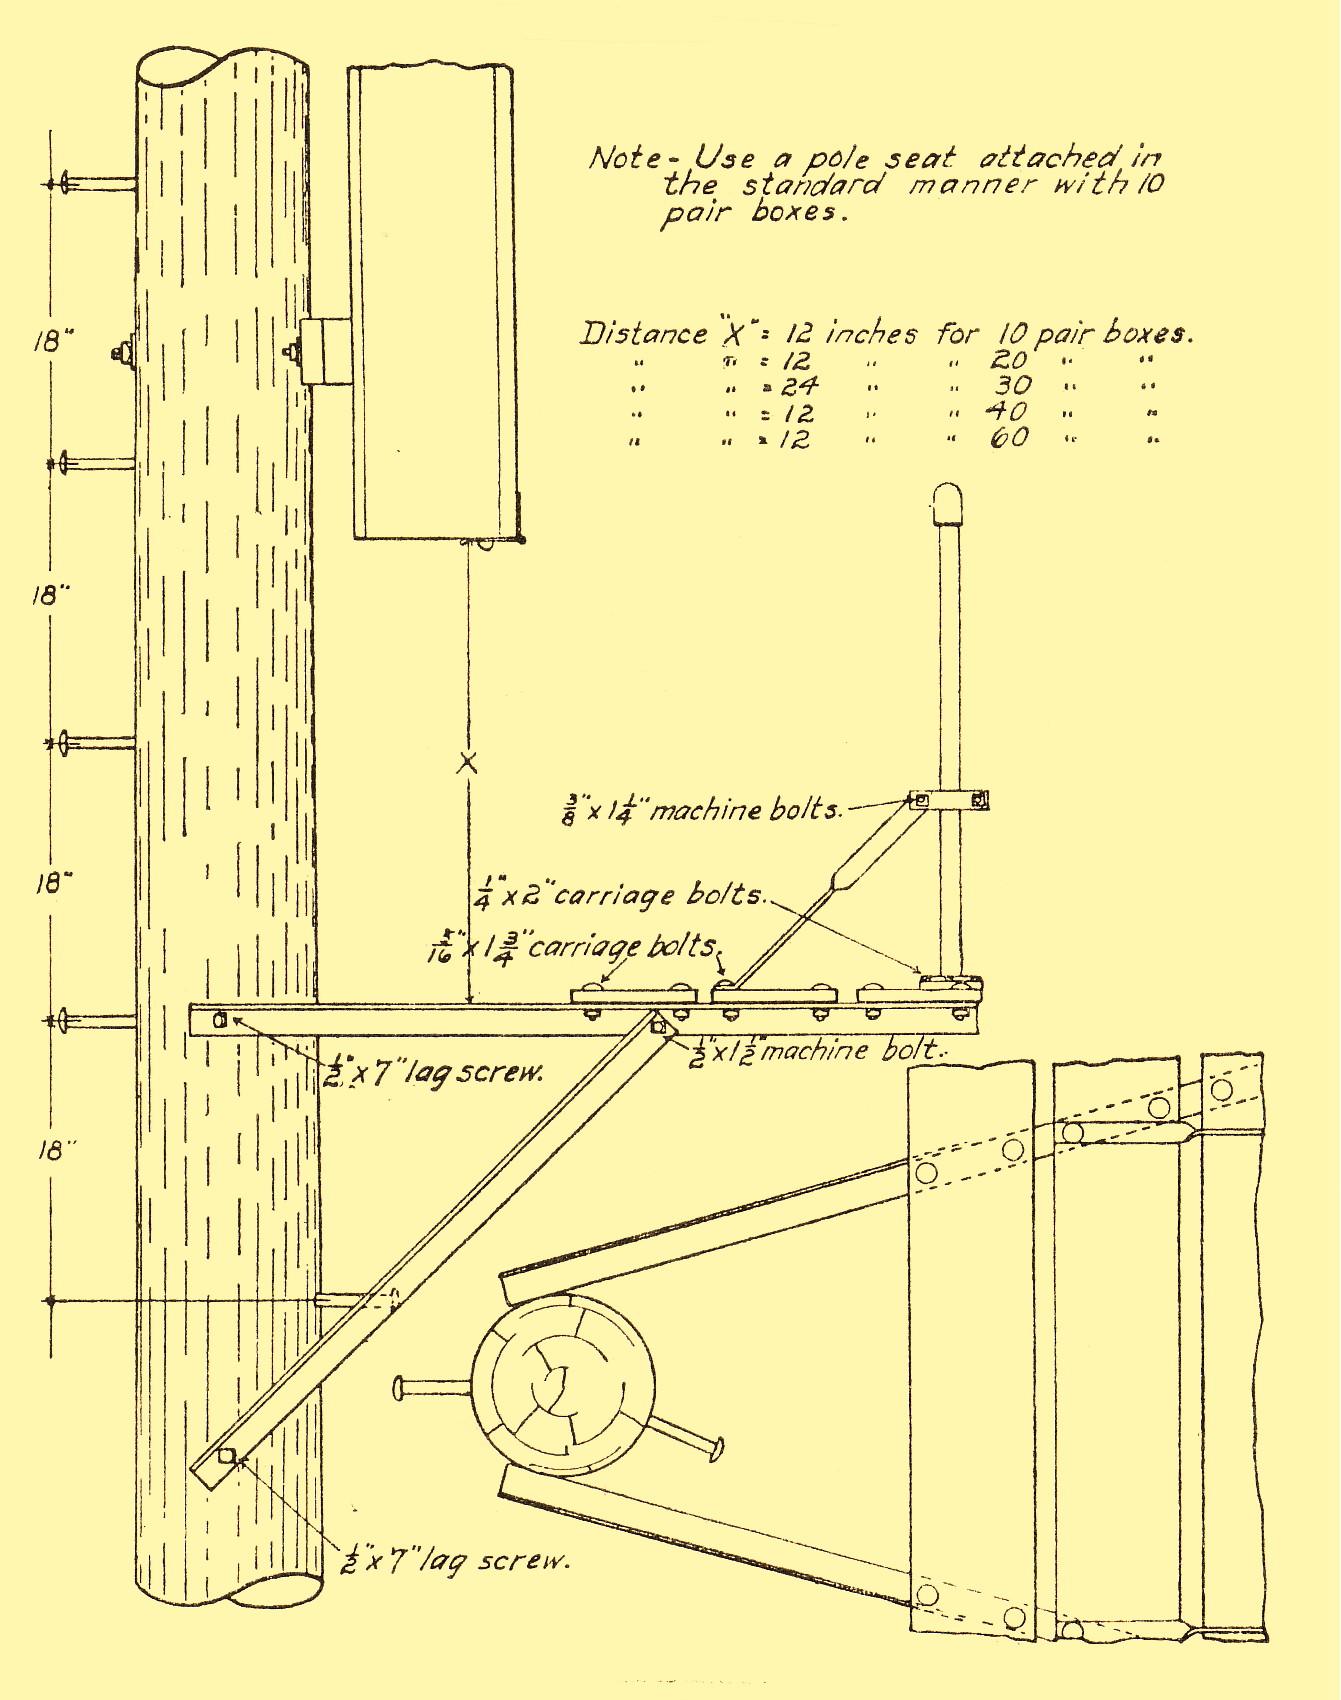 bd-or-distributing-box-pole-balcony-details